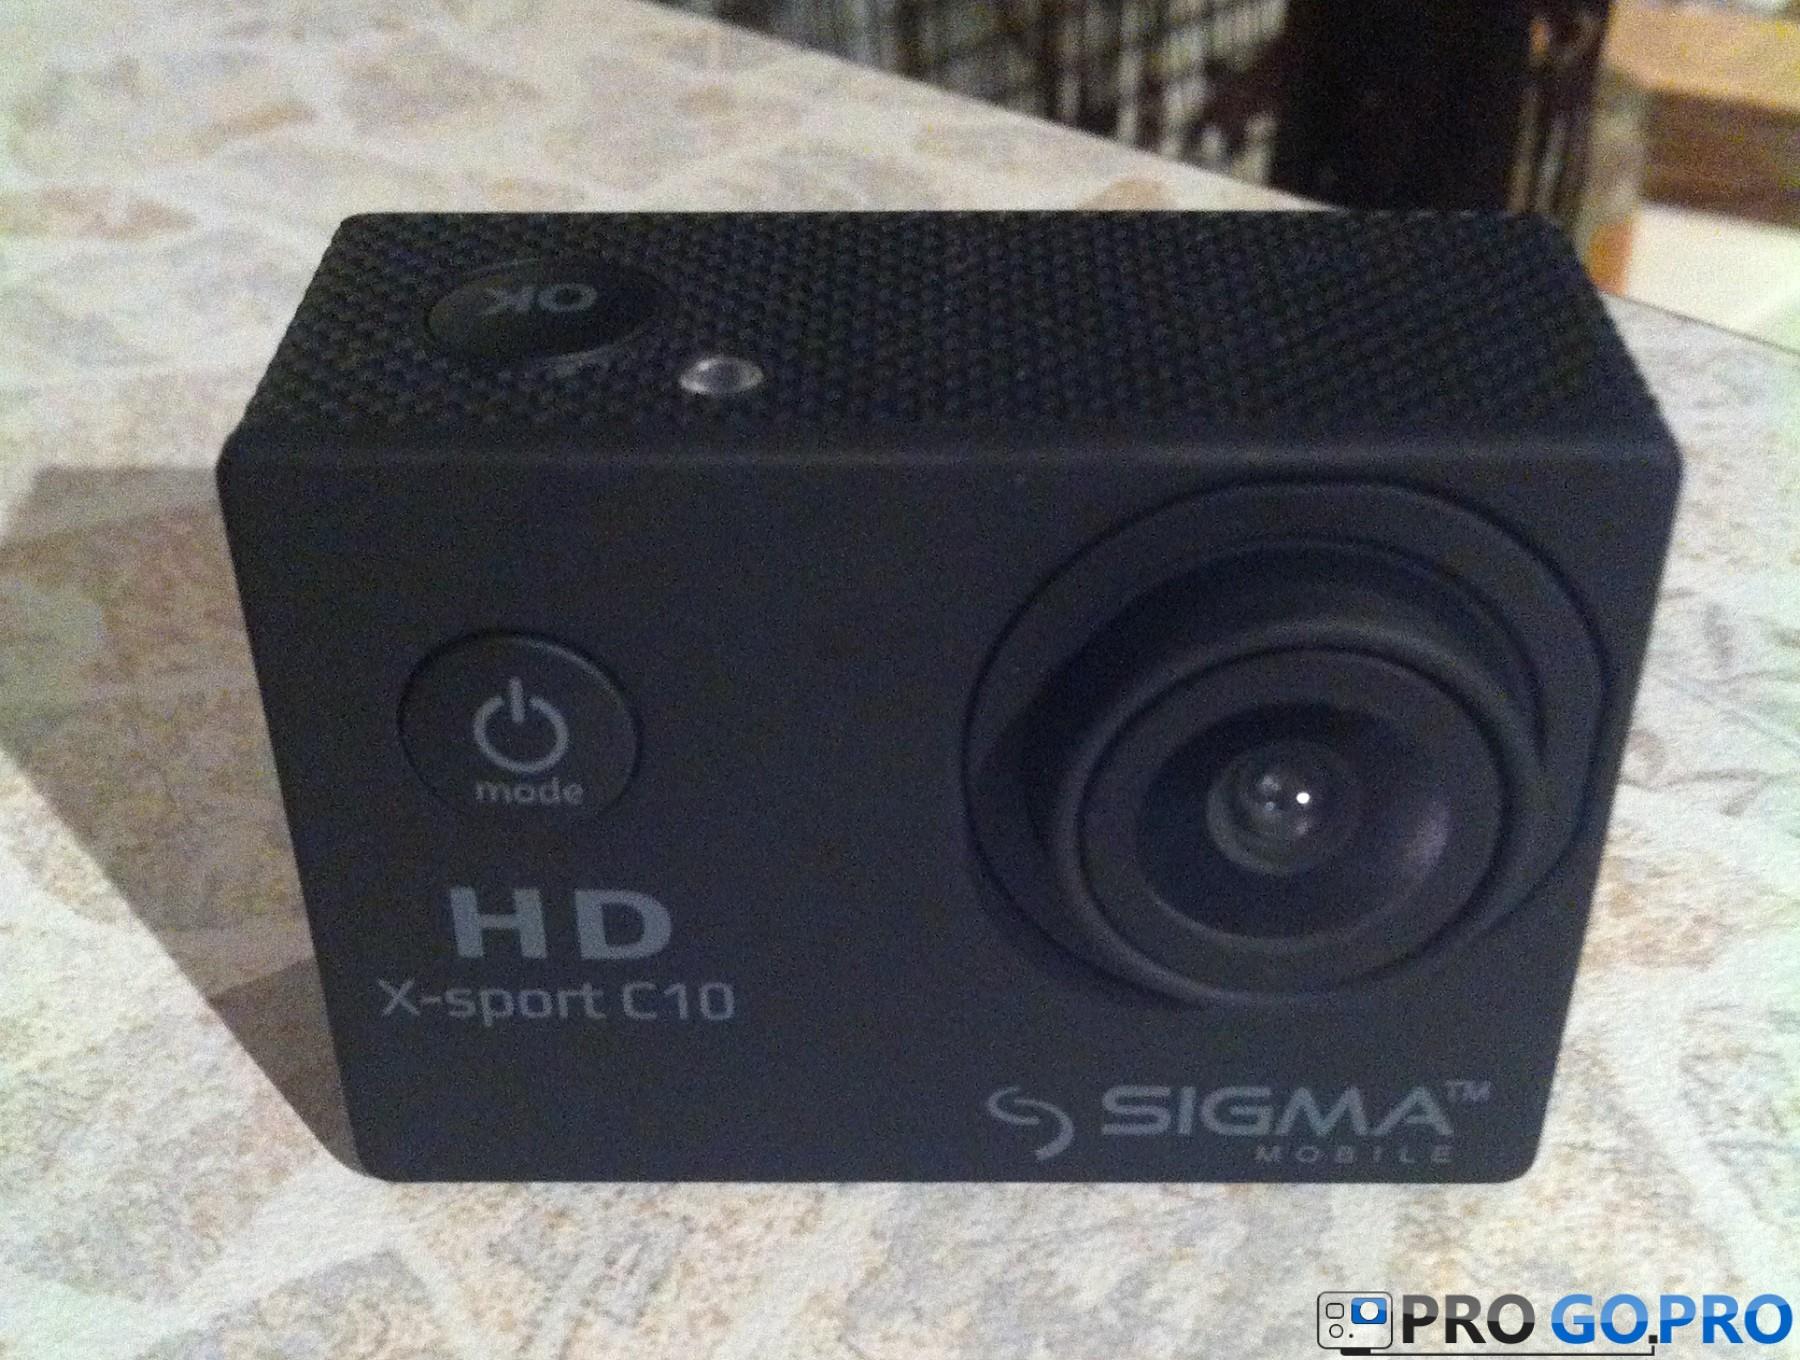 Отзыв об экшн камере Sigma mobile X-sport C10